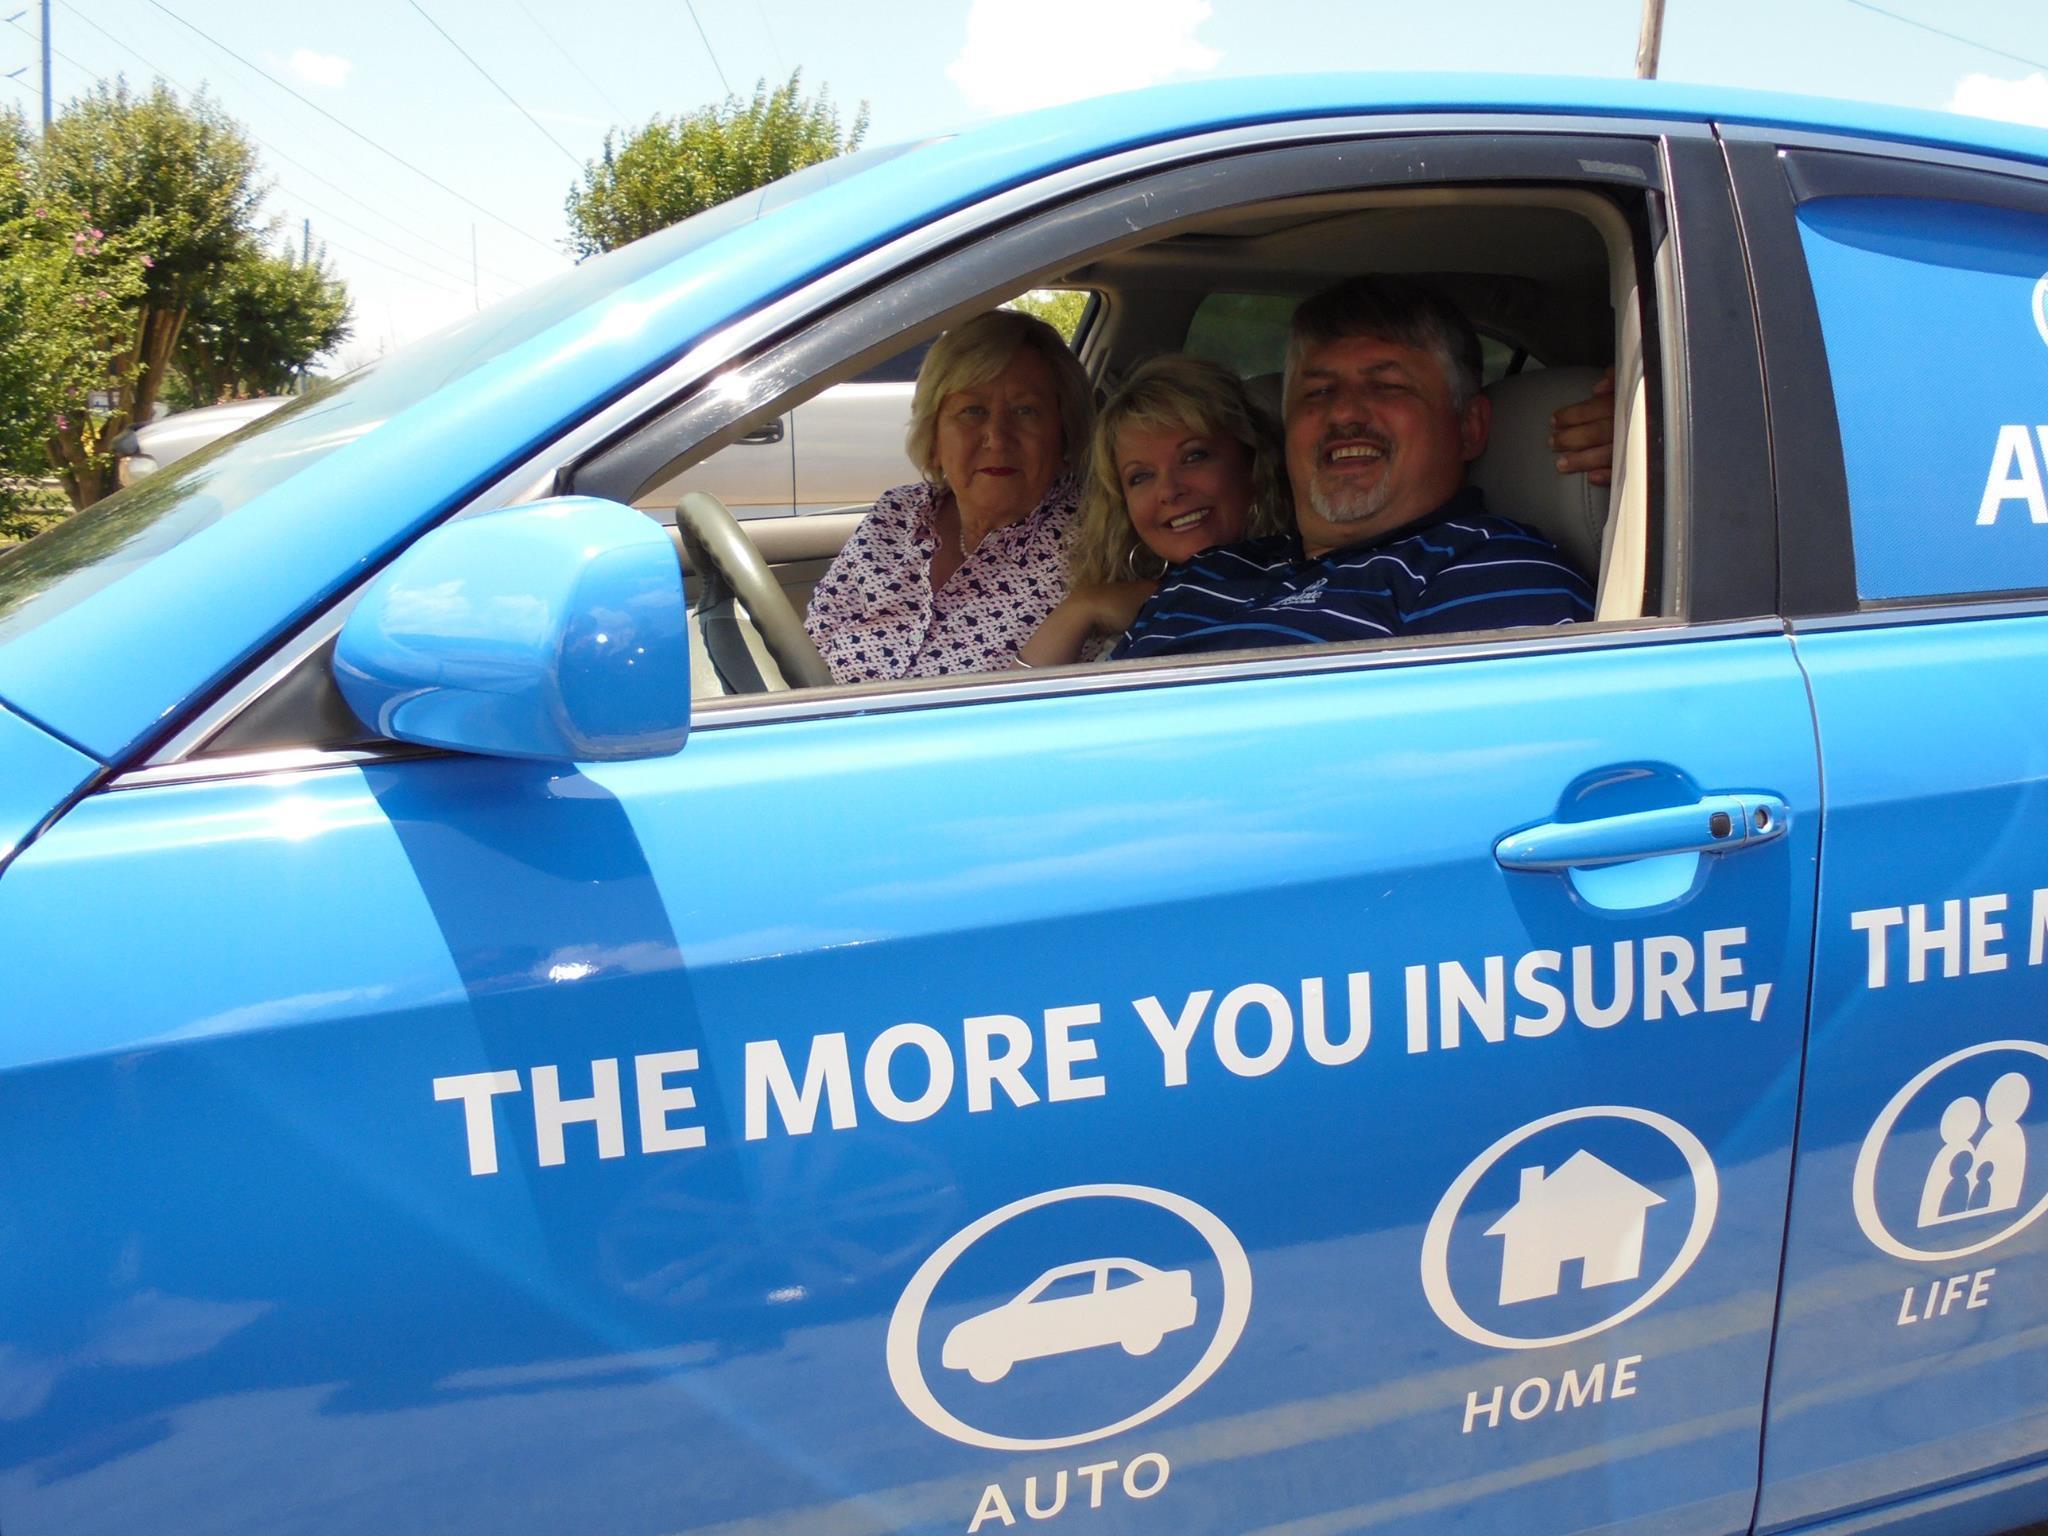 Blake Wright: Allstate Insurance image 6